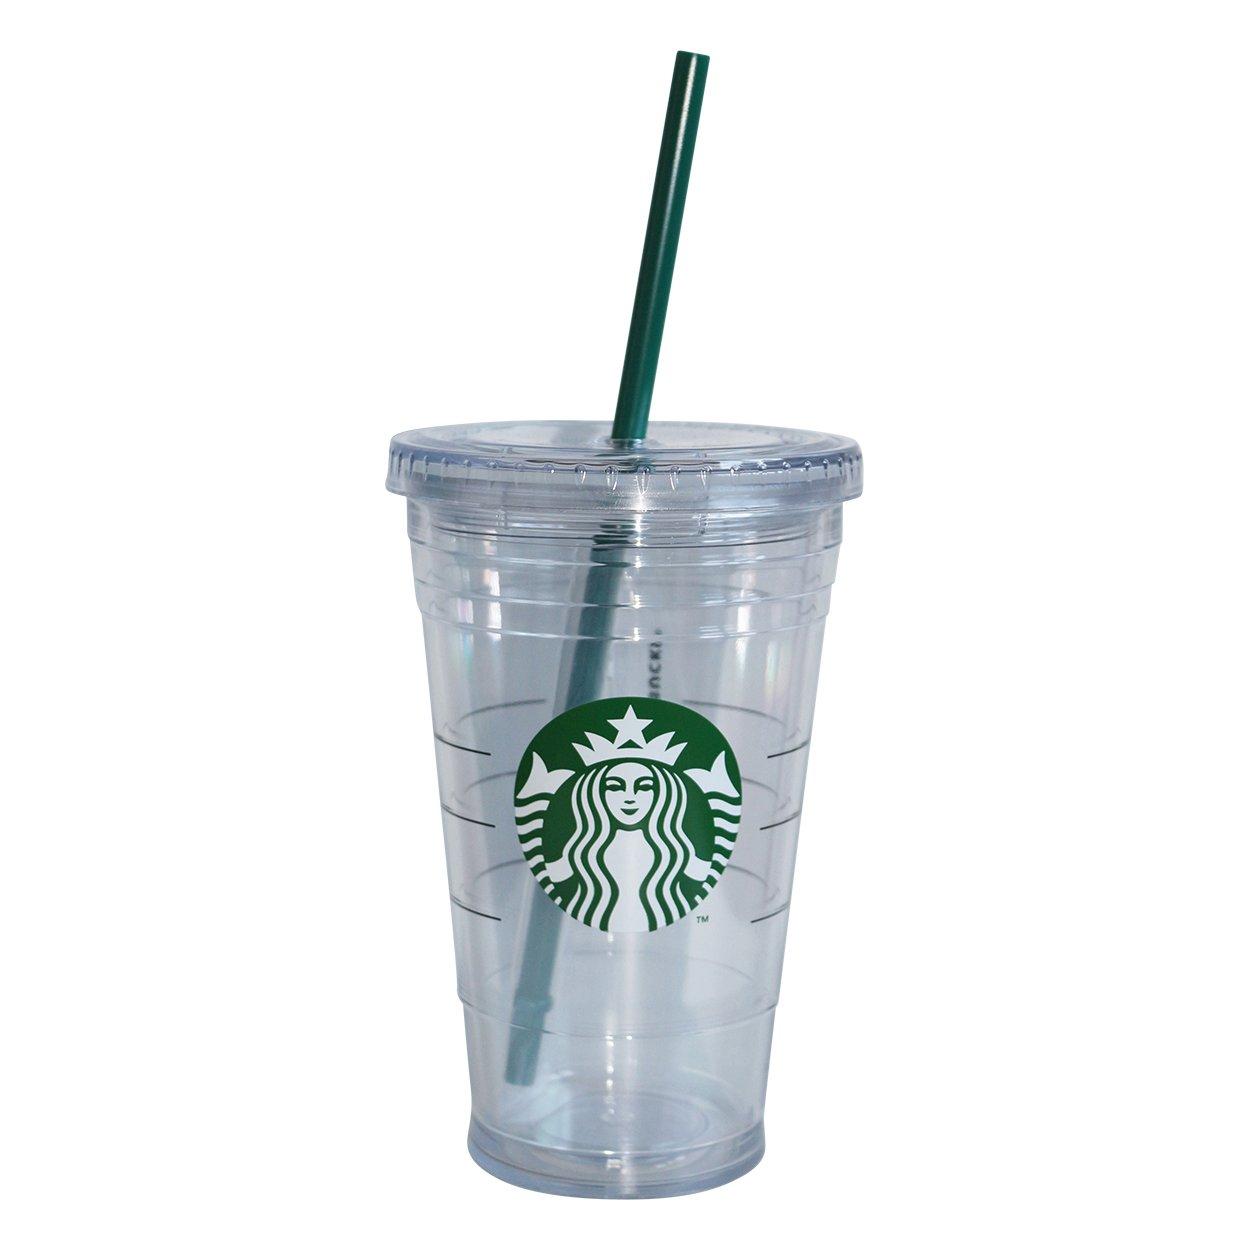 starbucks cold tumbler cup mug 16 fl oz amazon co uk kitchen home